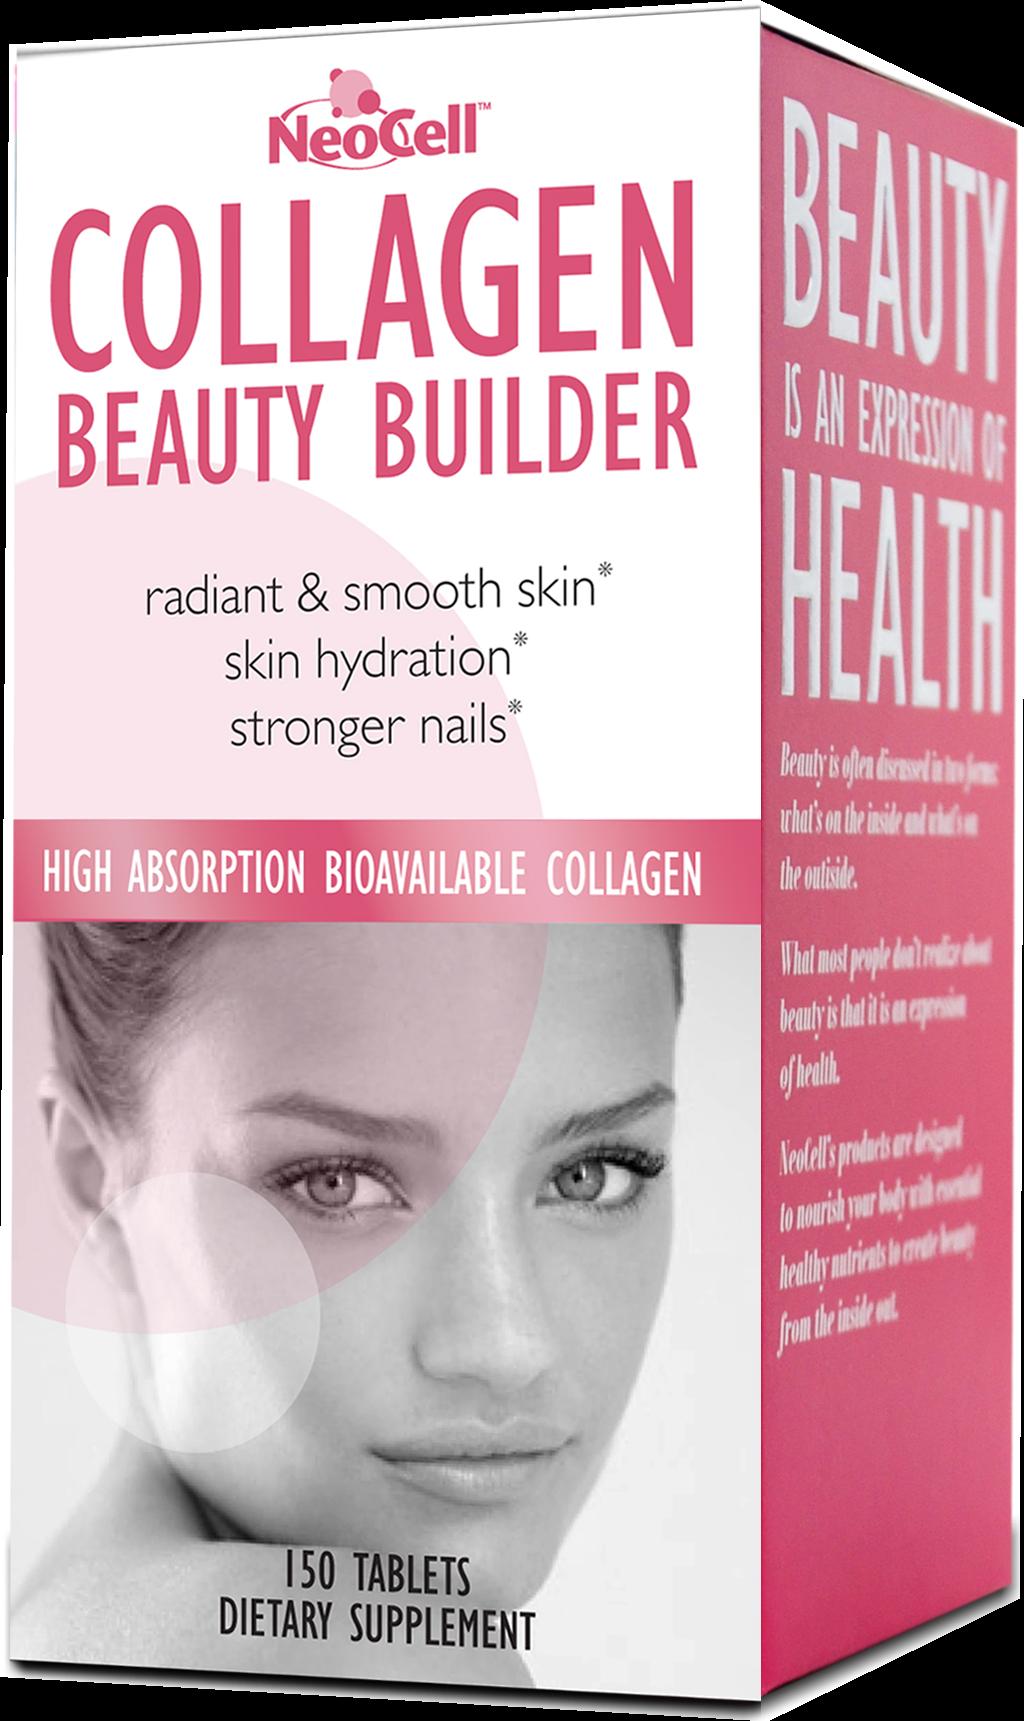 Neocell Beauty Builder Φόρμουλα Κολλαγόνου Ομορφιάς Και Ευεξίας 150tabs